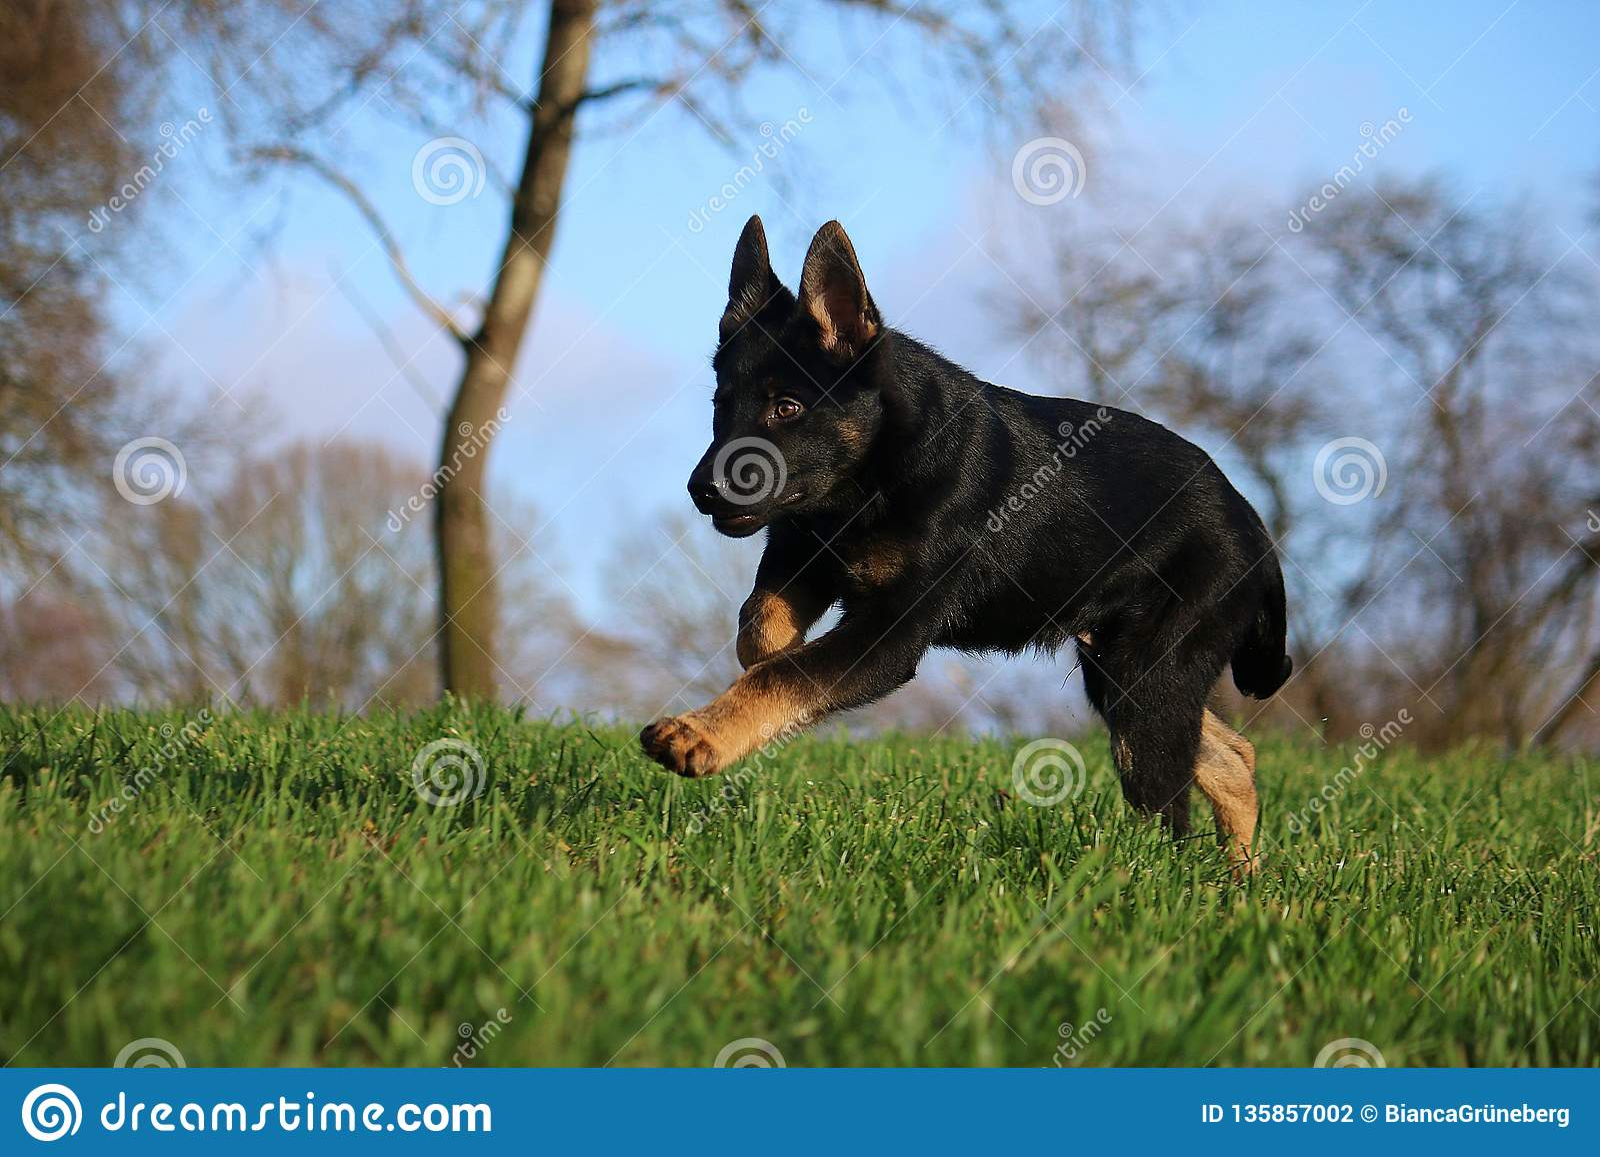 Running German Shepherd Puppy Stock Photo Image Of Canine Happiness 135857002